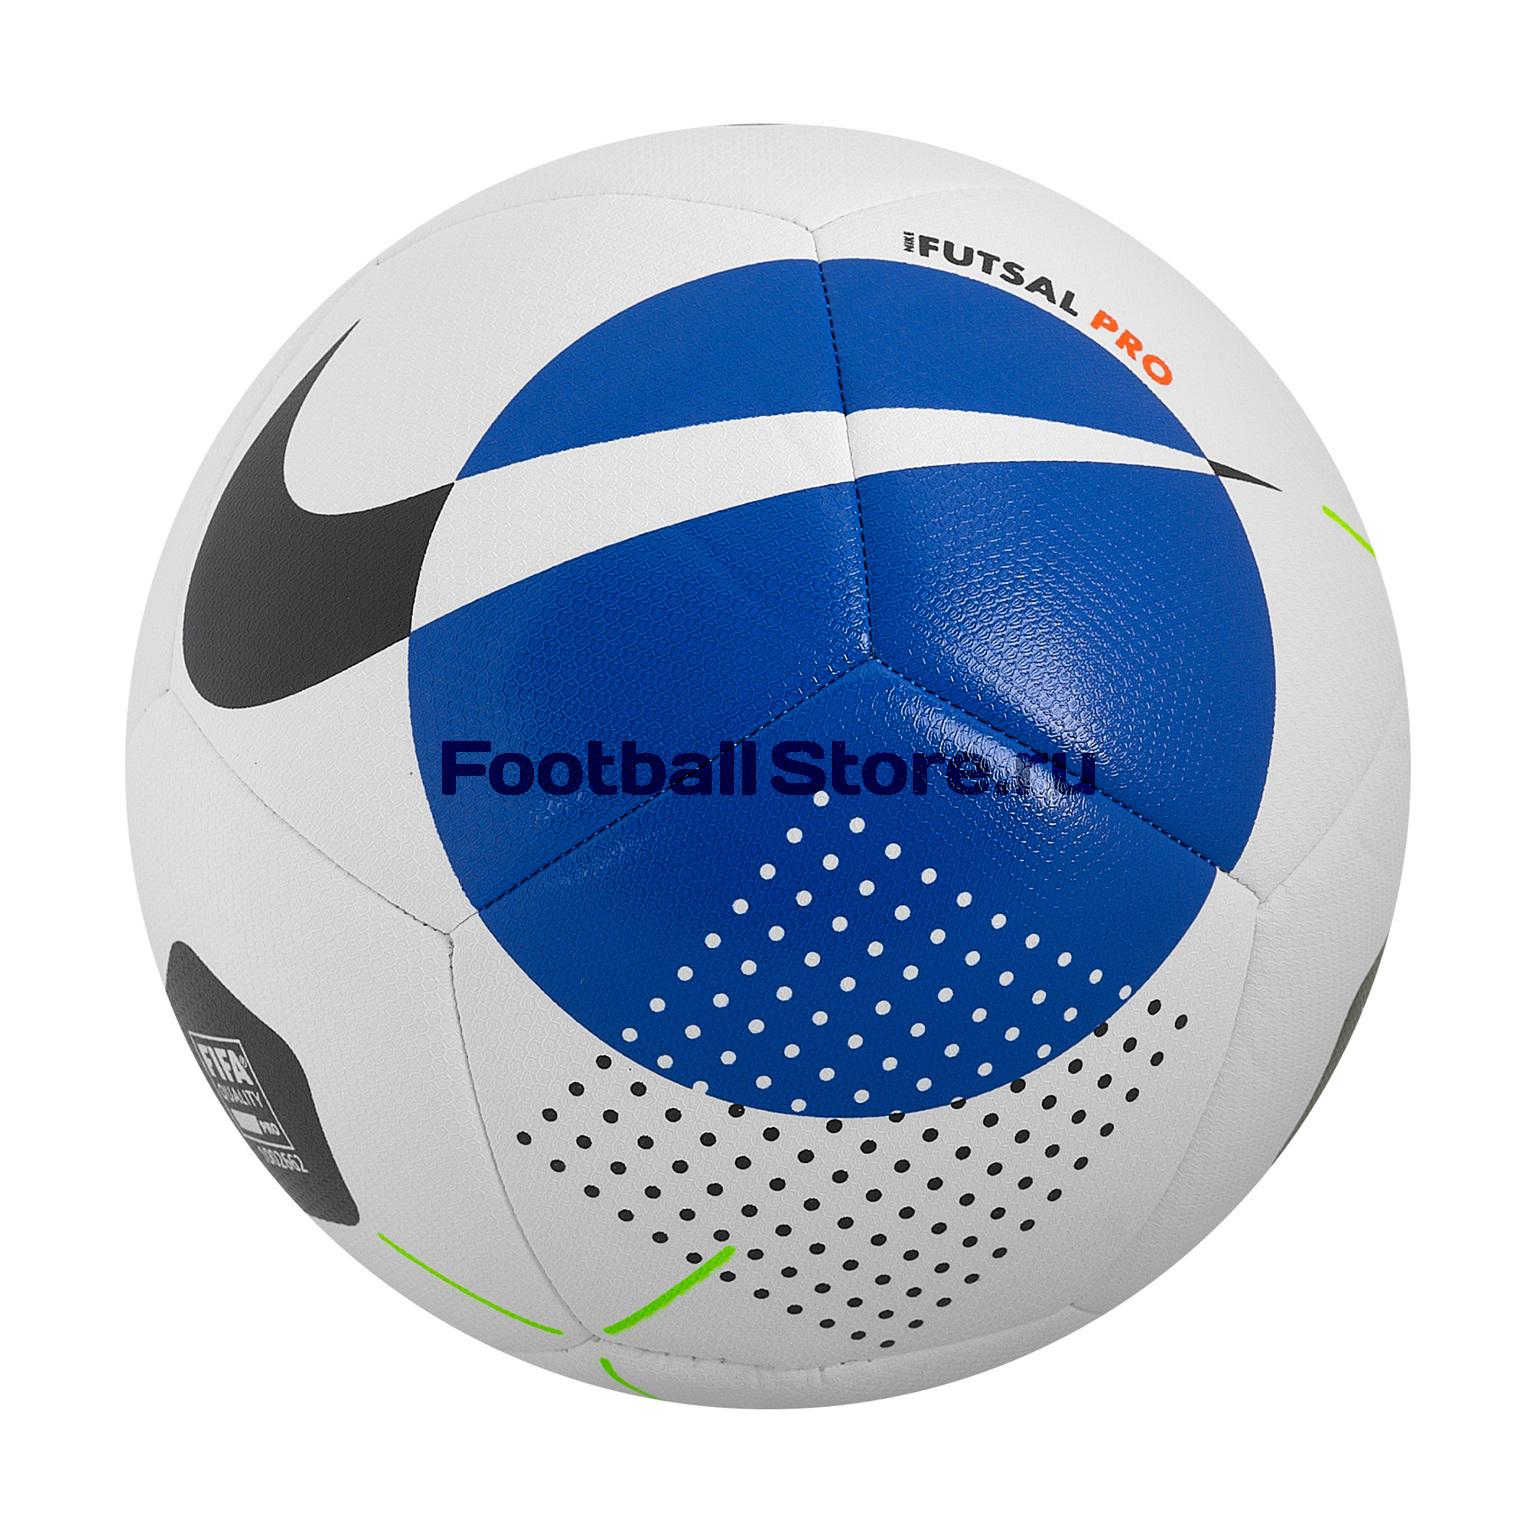 Футзальный мяч Nike Futsal Pro SC3971-101